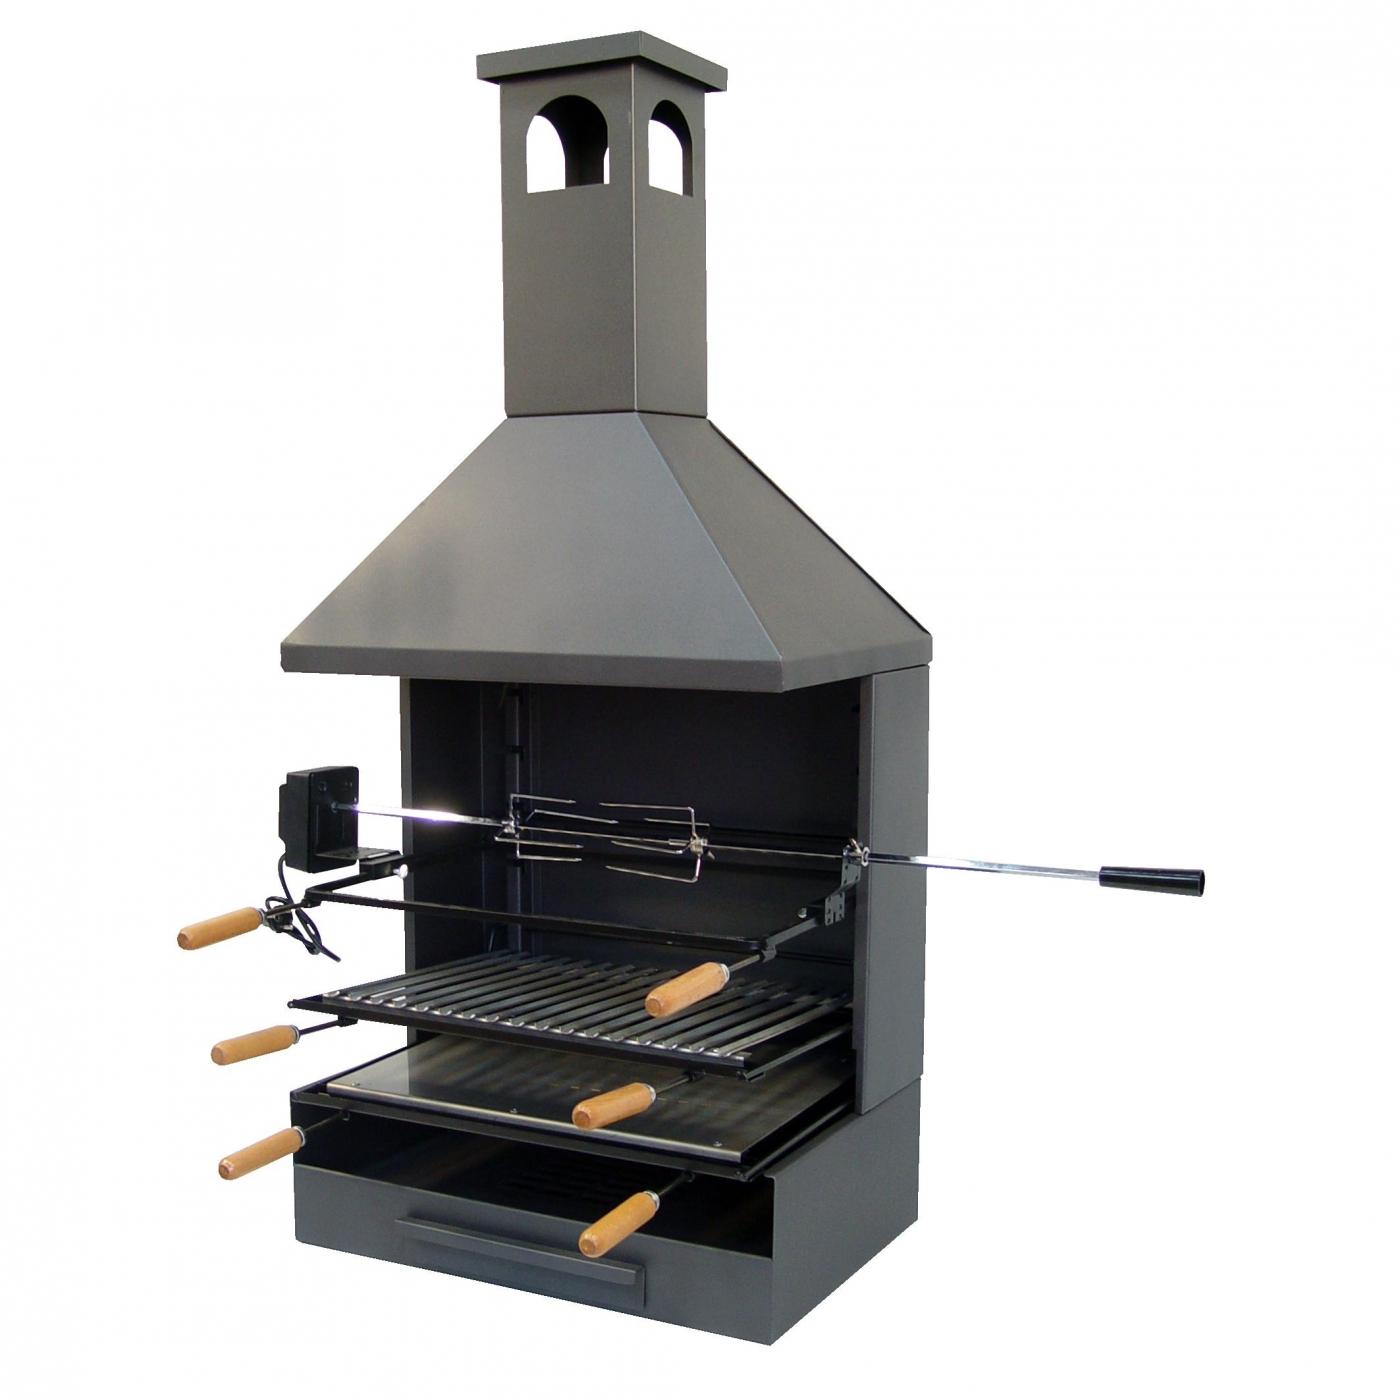 barbecue avec bac cendre et chemin e compl te par 325 99 sur planeta huerto. Black Bedroom Furniture Sets. Home Design Ideas